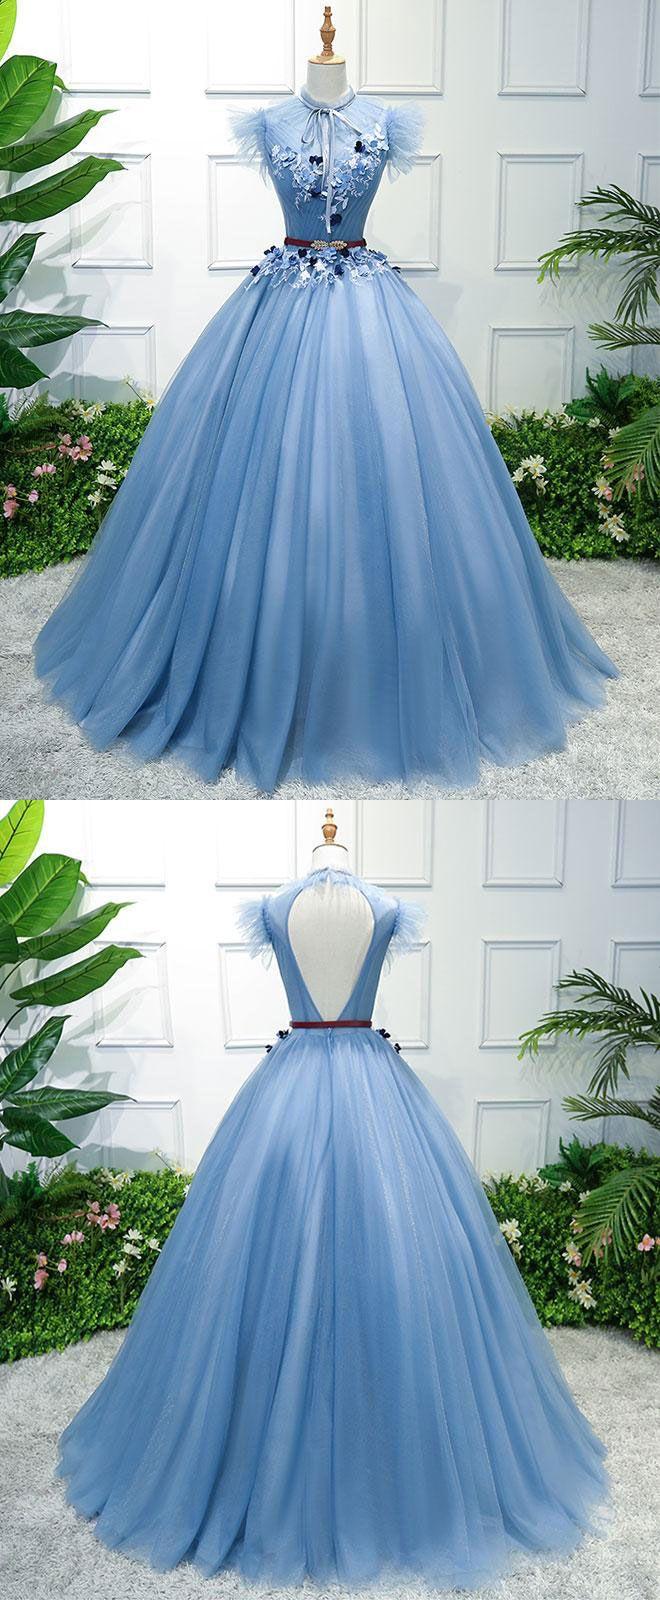 Blue high neck tulle blue long prom dress blue evening dress